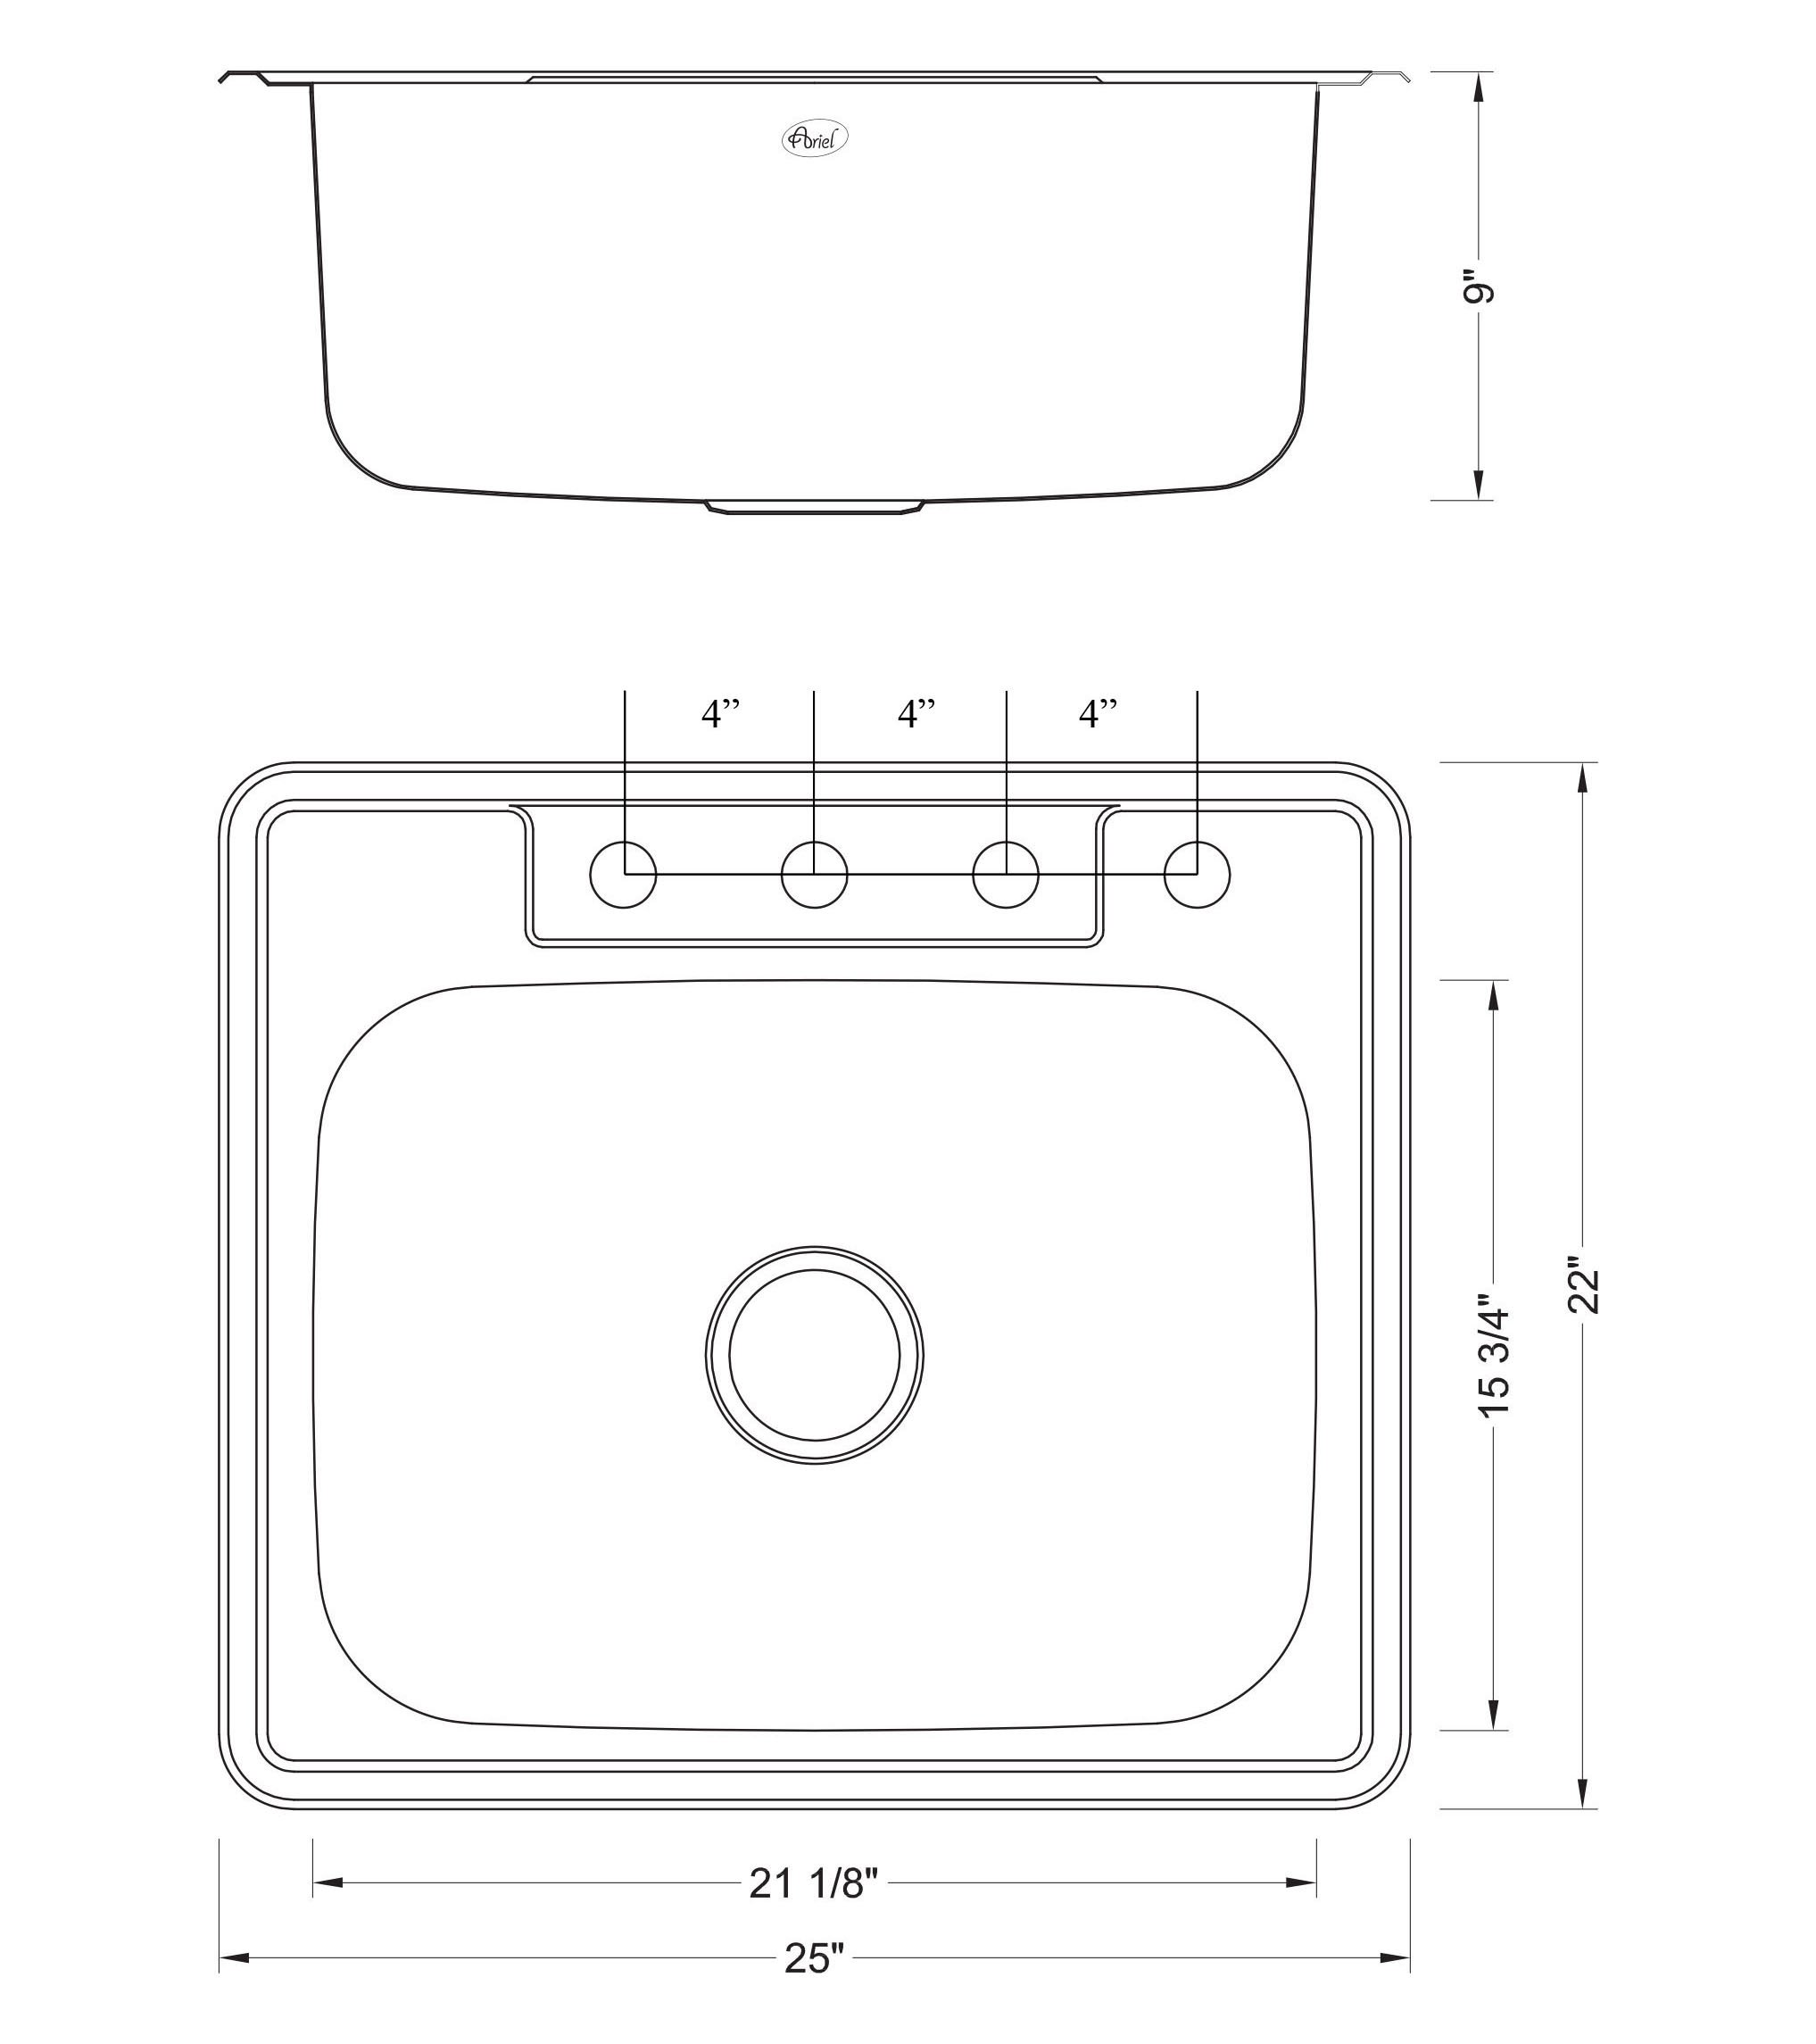 25 Inch Top-Mount / Drop-In Stainless Steel Kitchen Island / Bar Sink - 18 Gauge